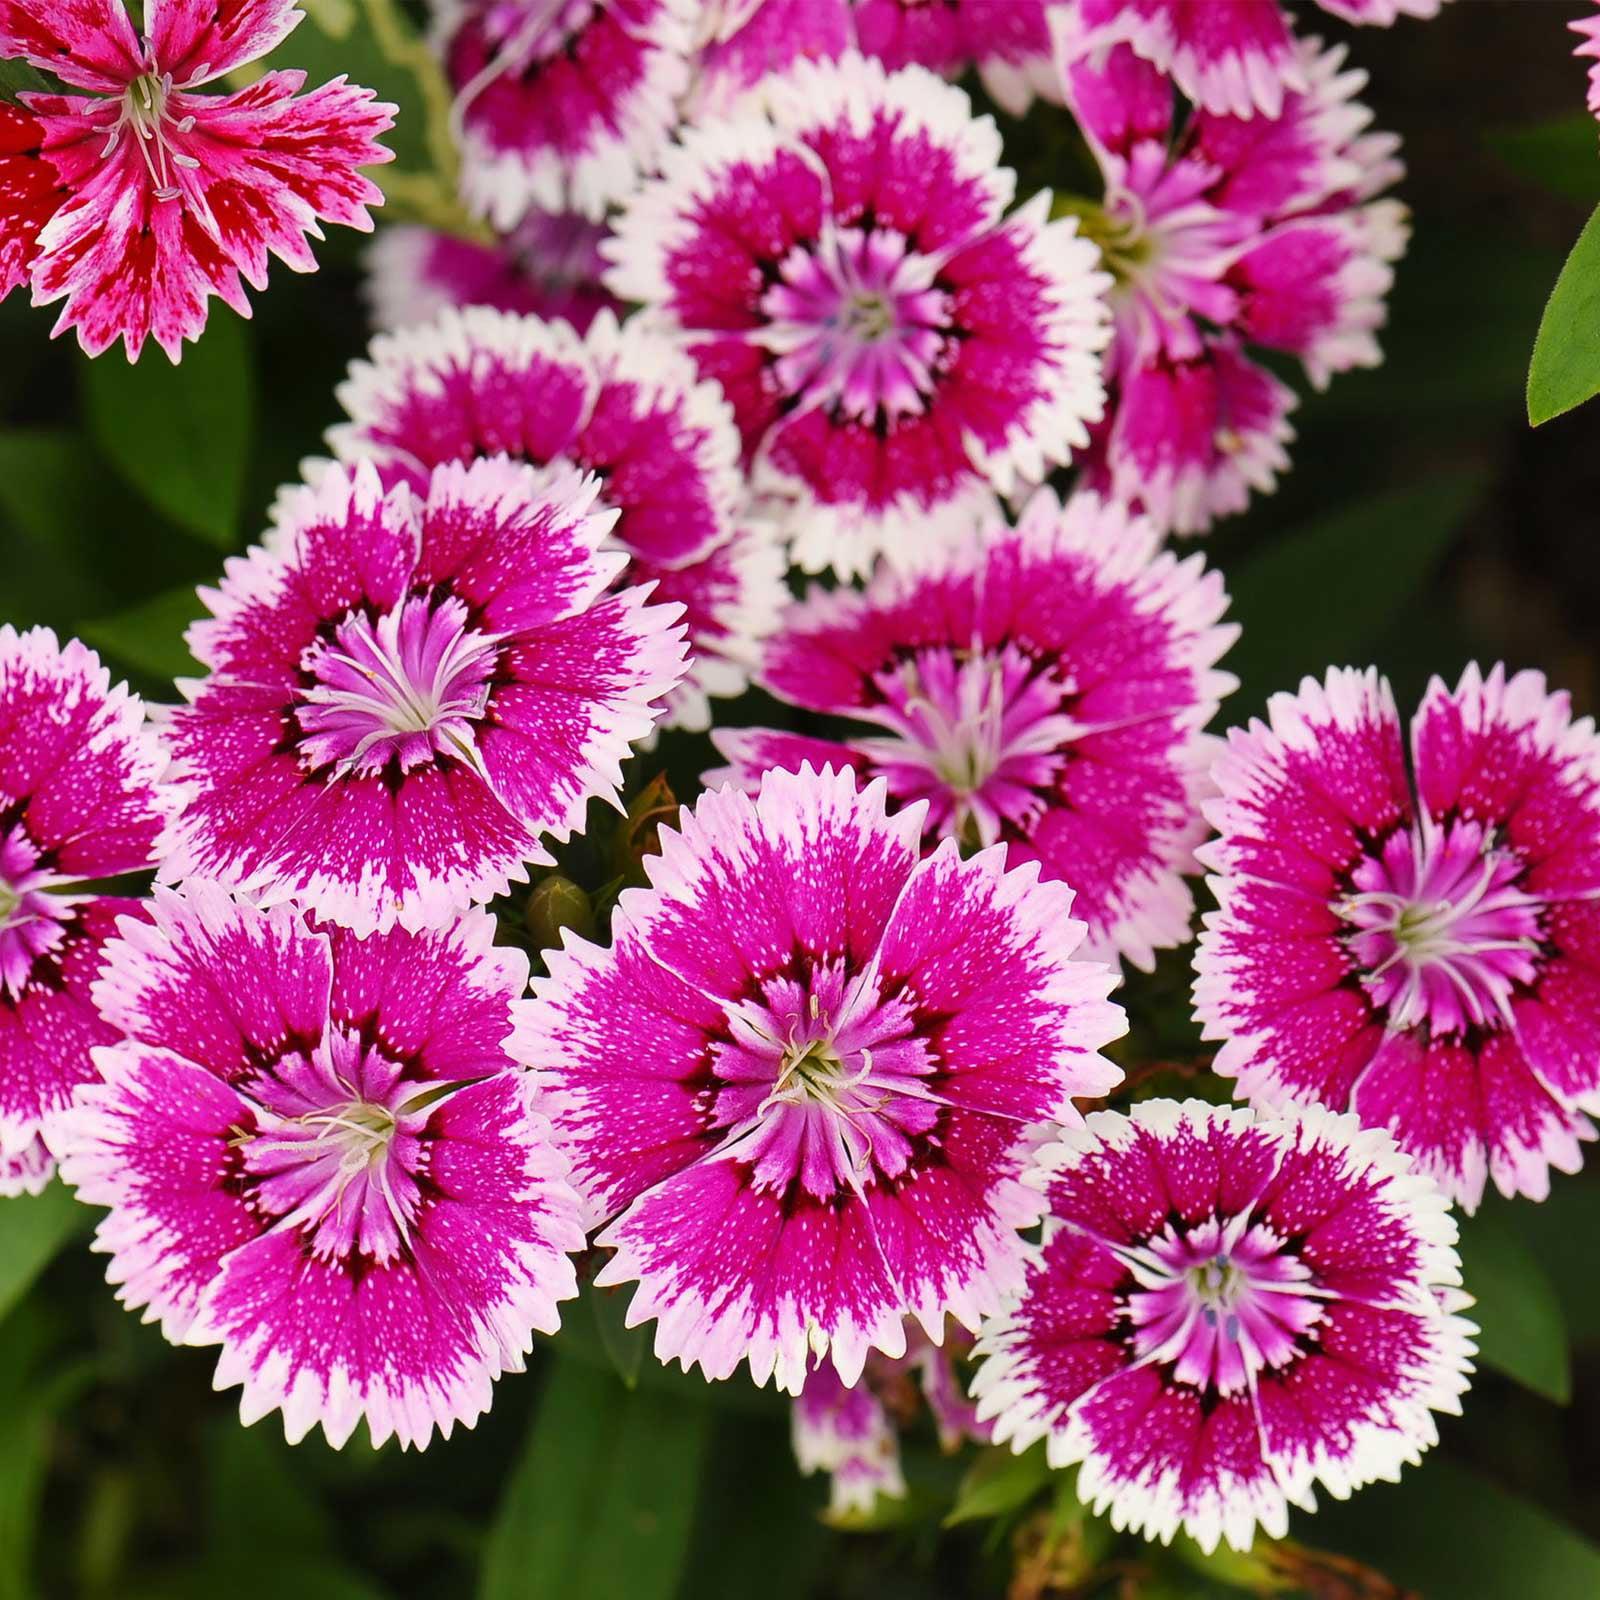 Dianthus Floral Lace Series Flower Seeds Violet Picotee 500